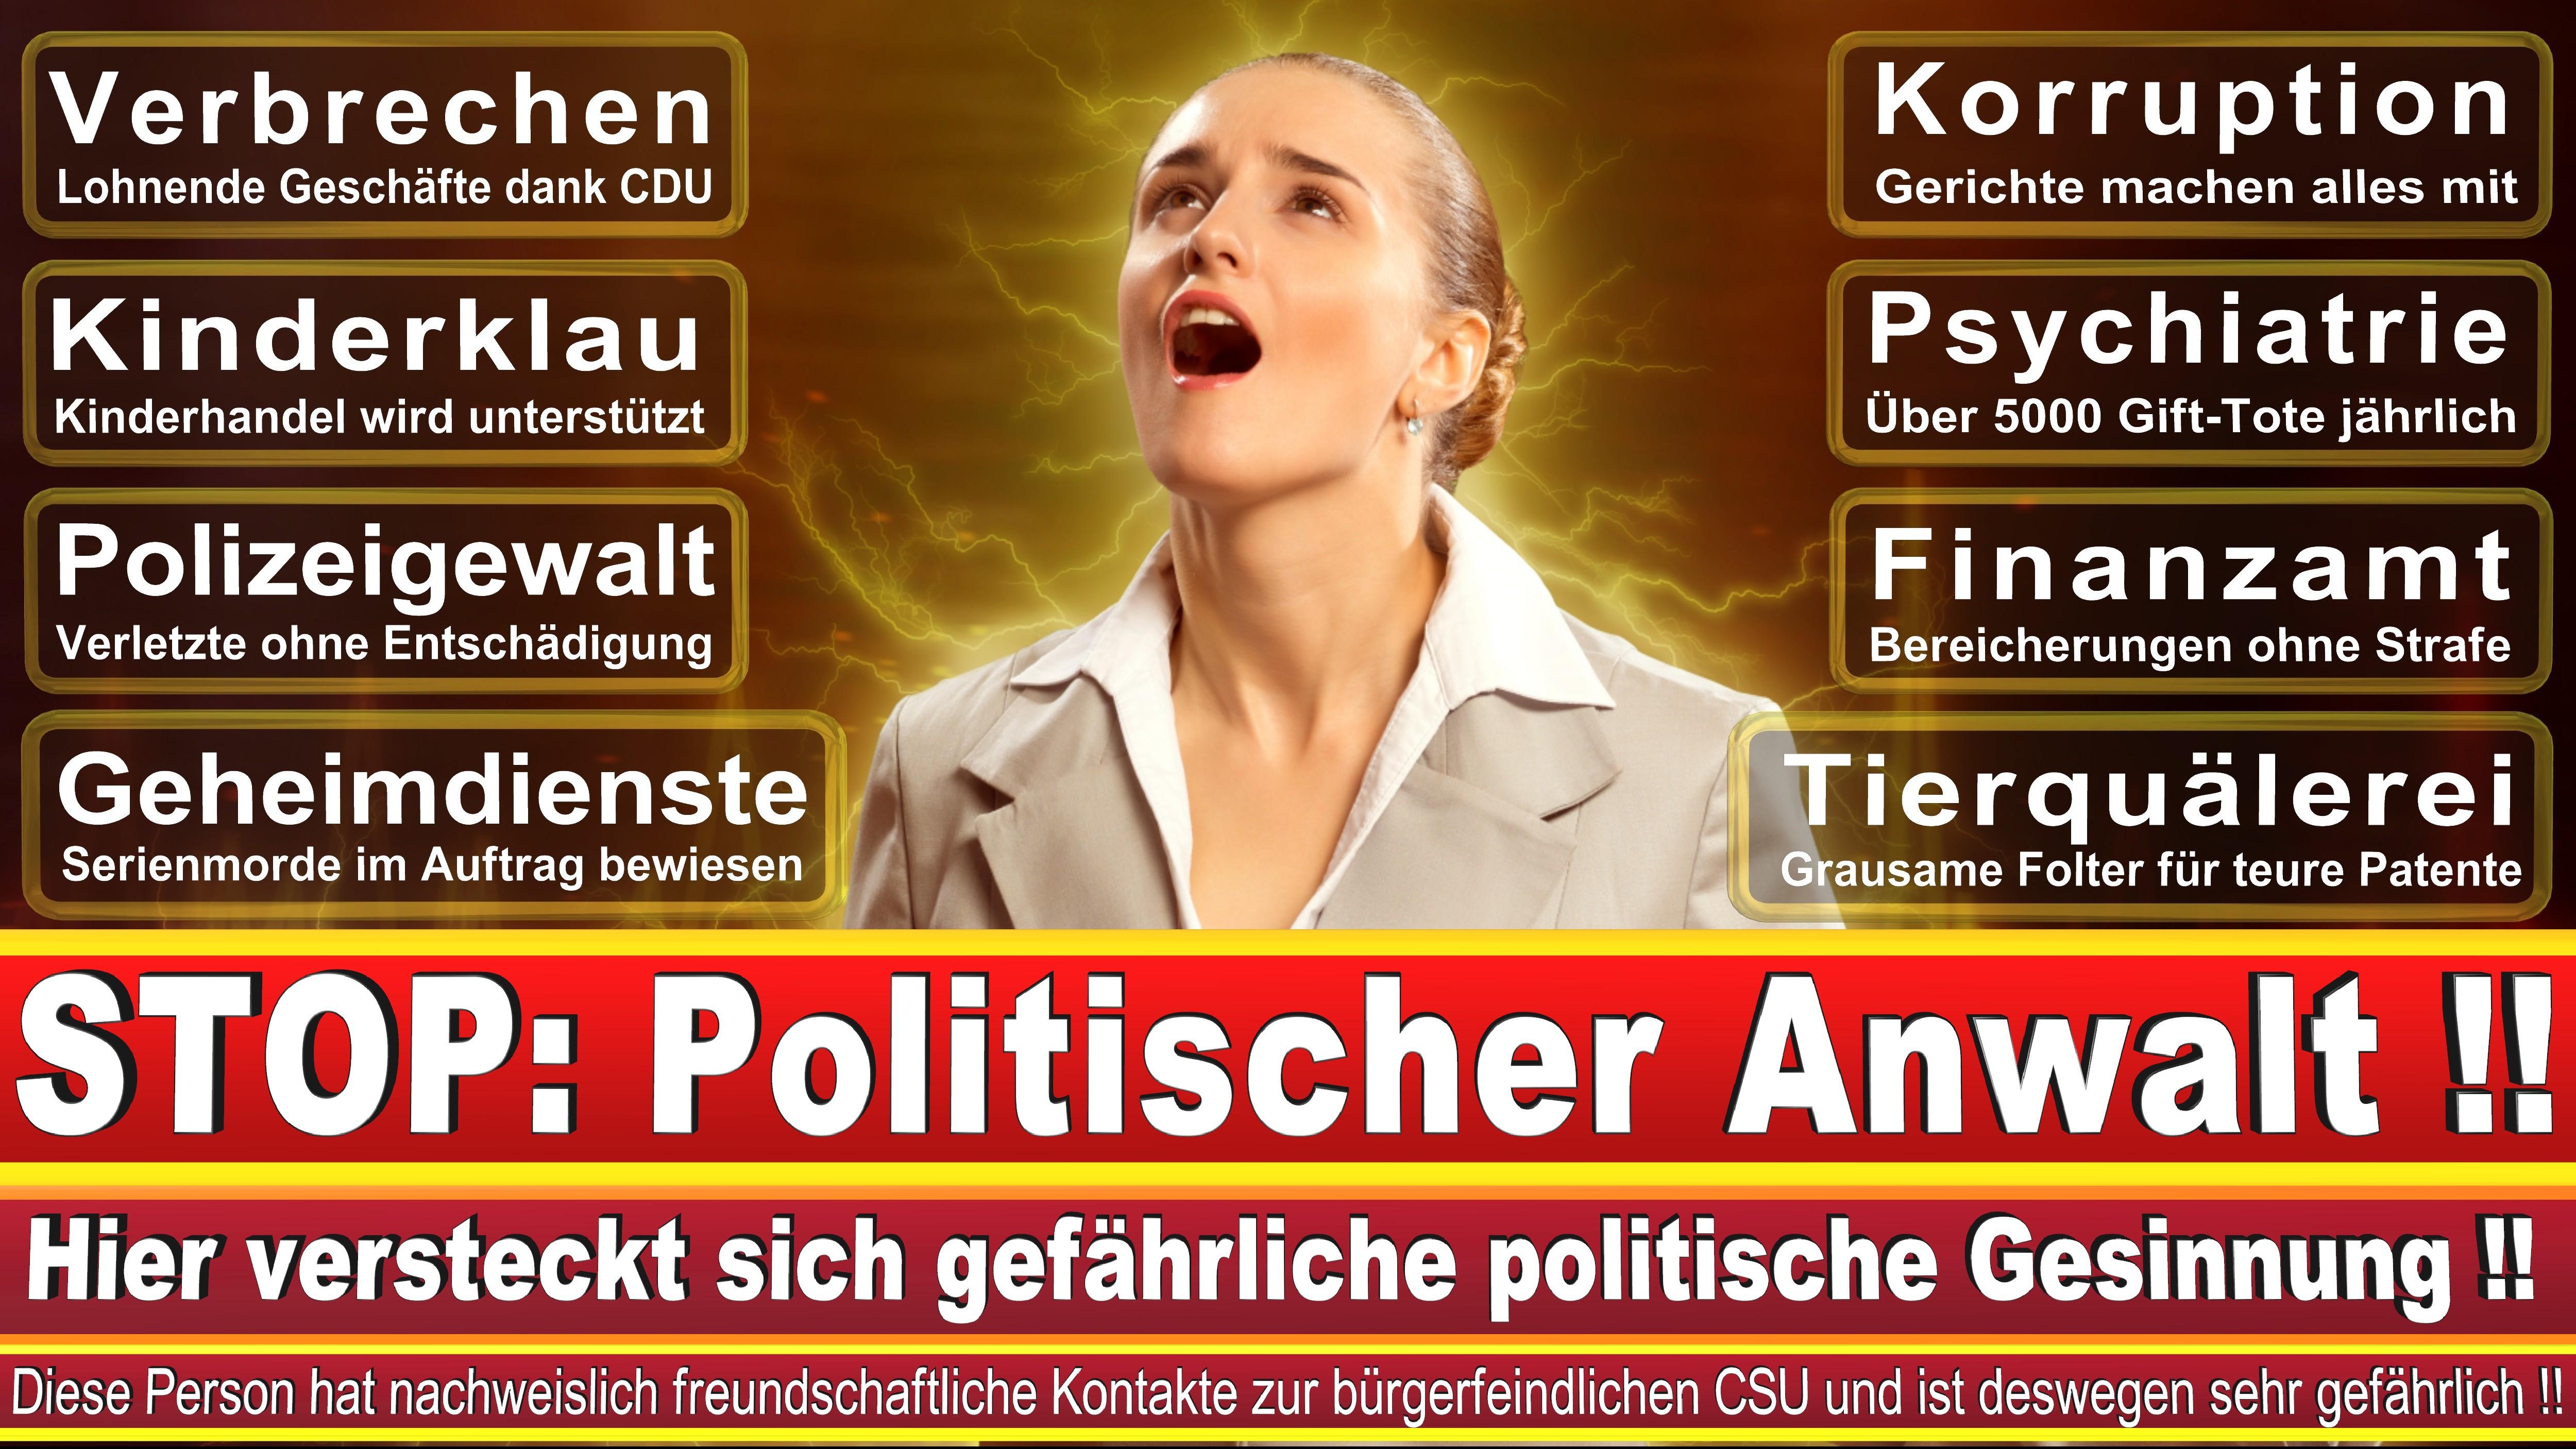 Rechtsanwältin Tanja Matthias Berlin Rechtsanwältin Freshfields Bruckhaus Deringer LLP